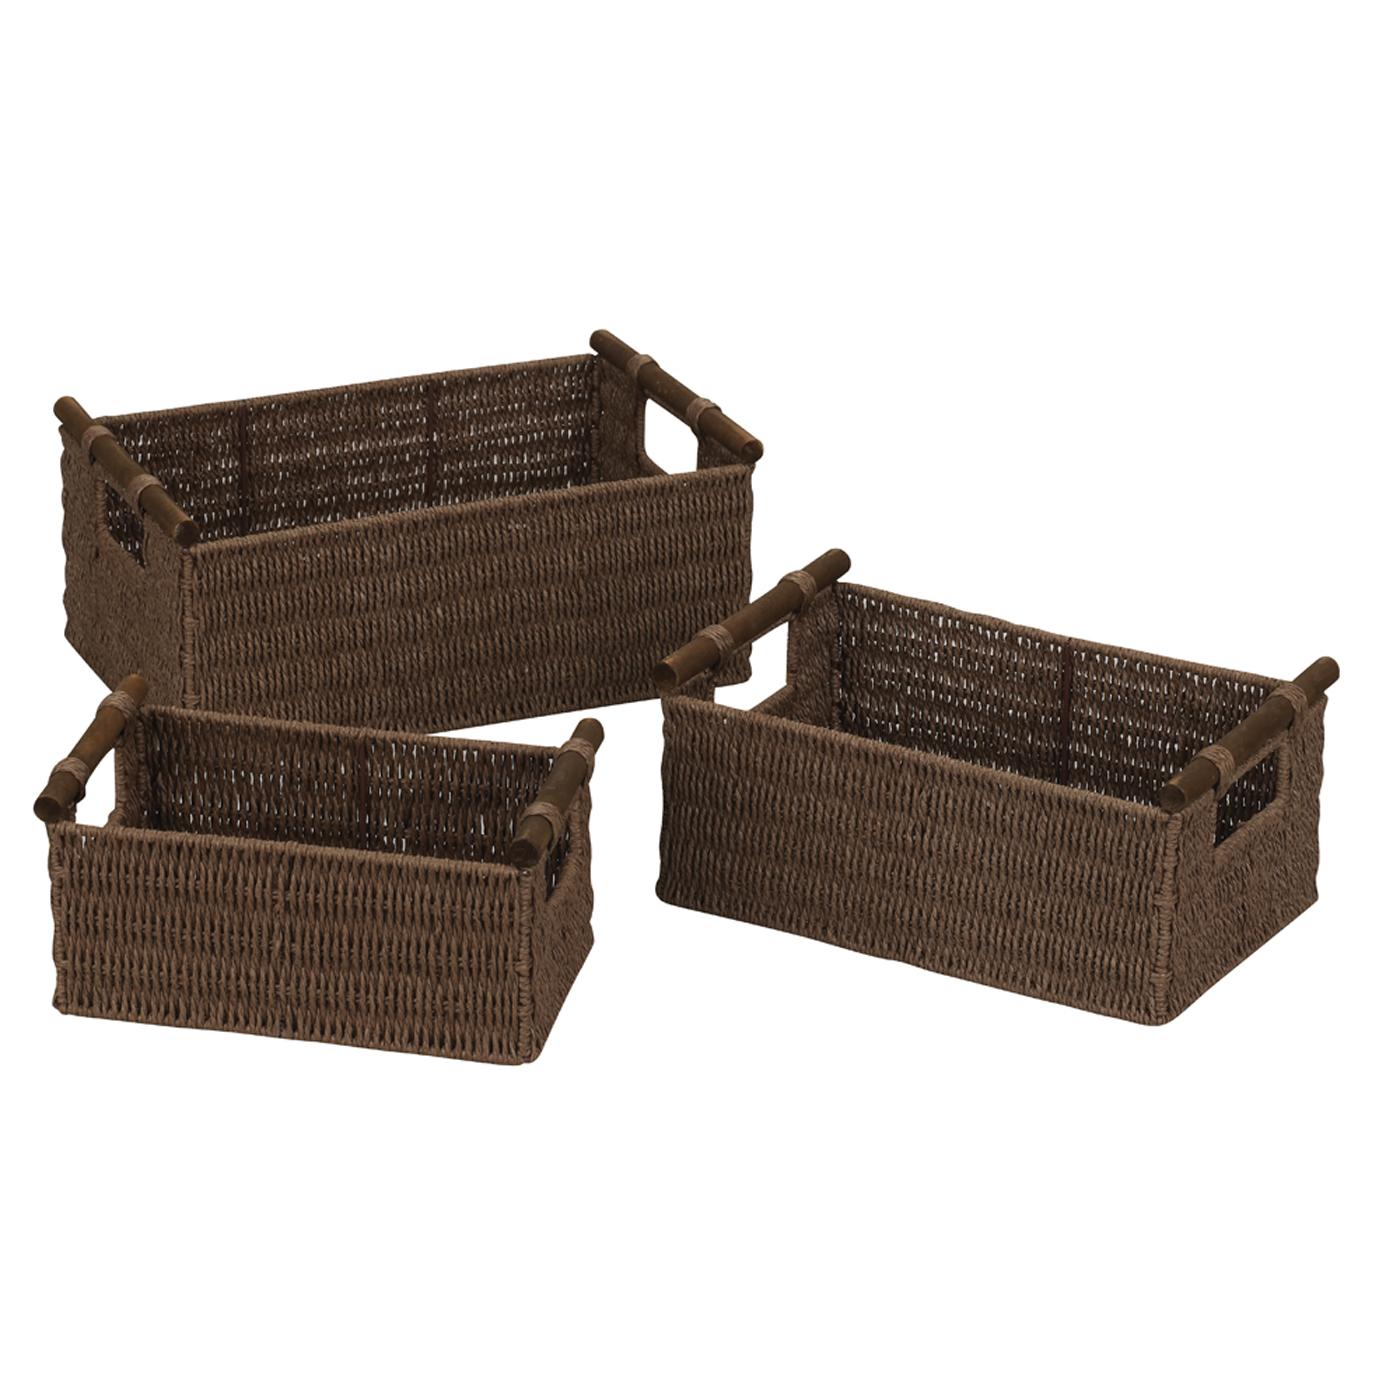 Paper Rope Woven Baskets Java Set Of 3 In Wicker Baskets